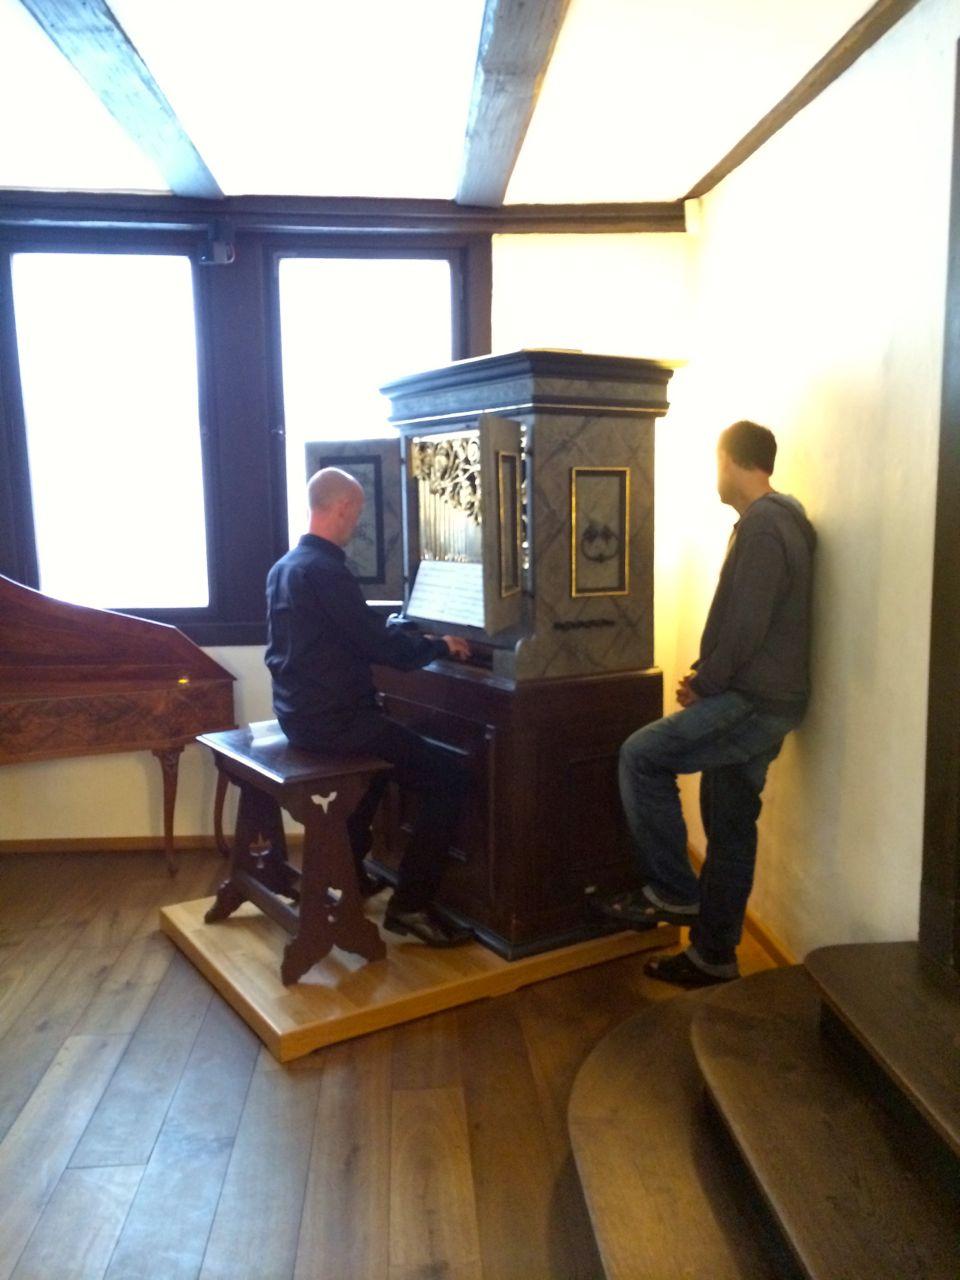 Casa museo de J.S.Bach